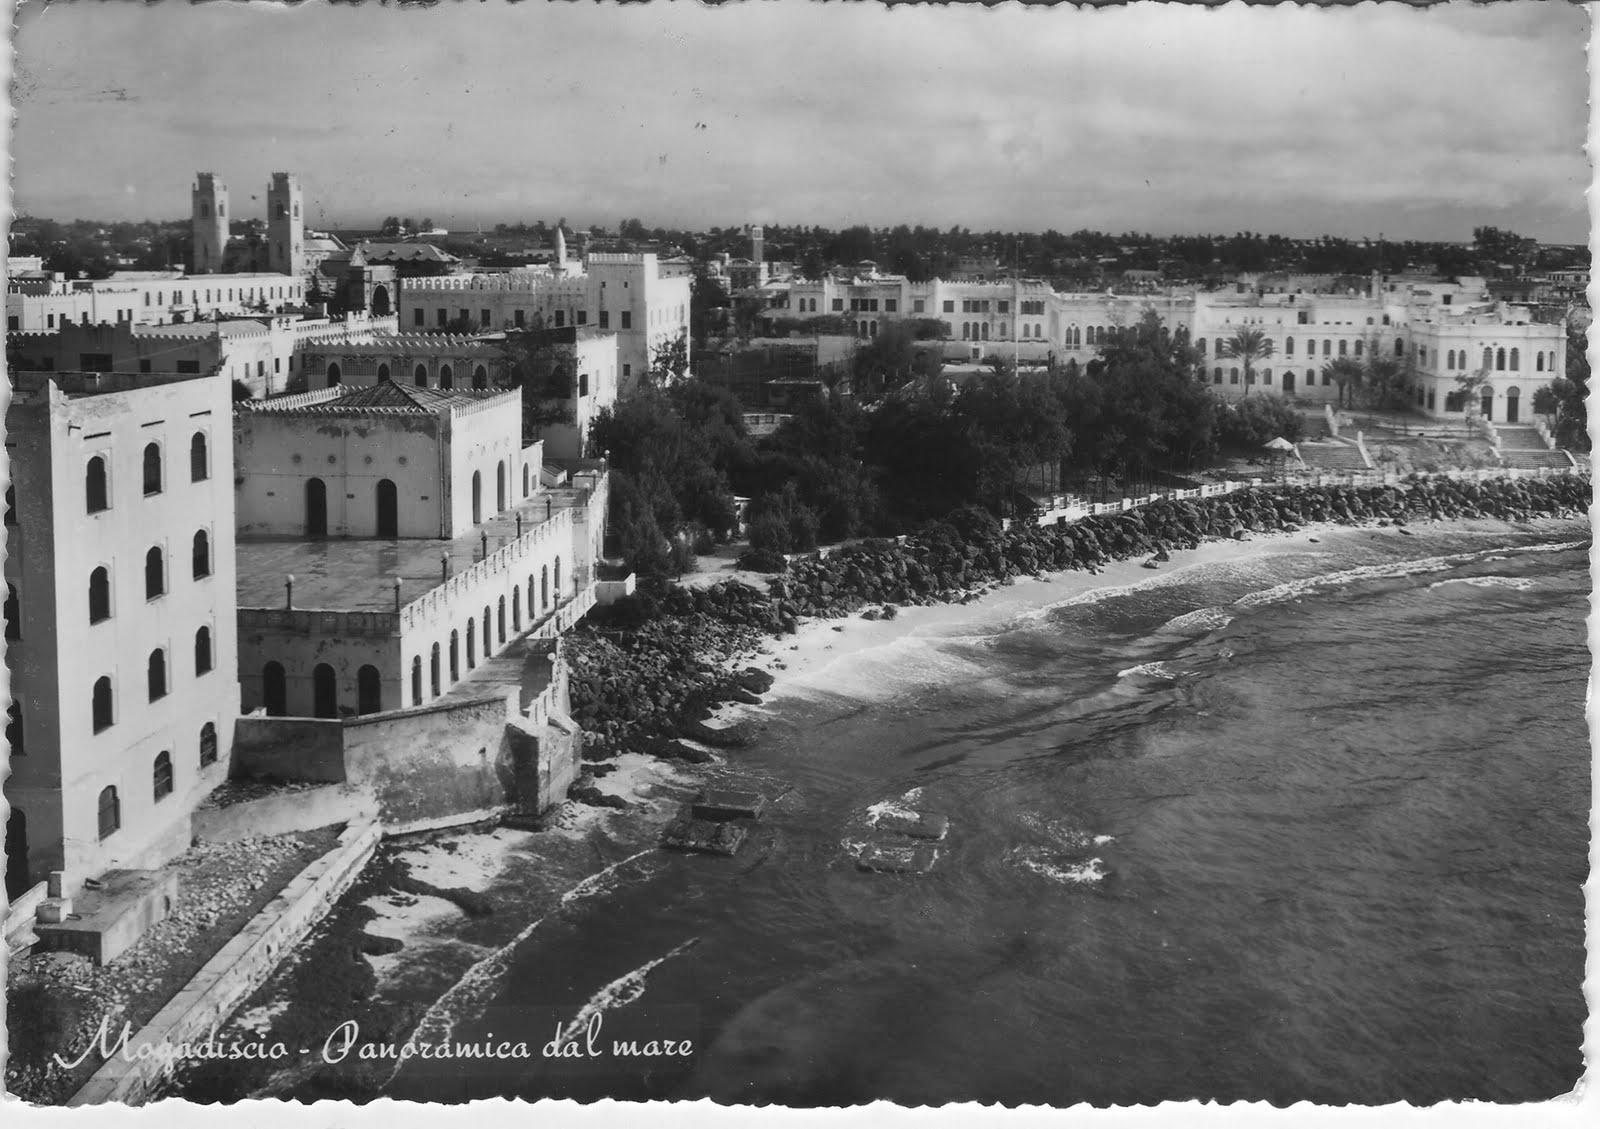 mogadishu_historic_city_preservation_sipus.jpg